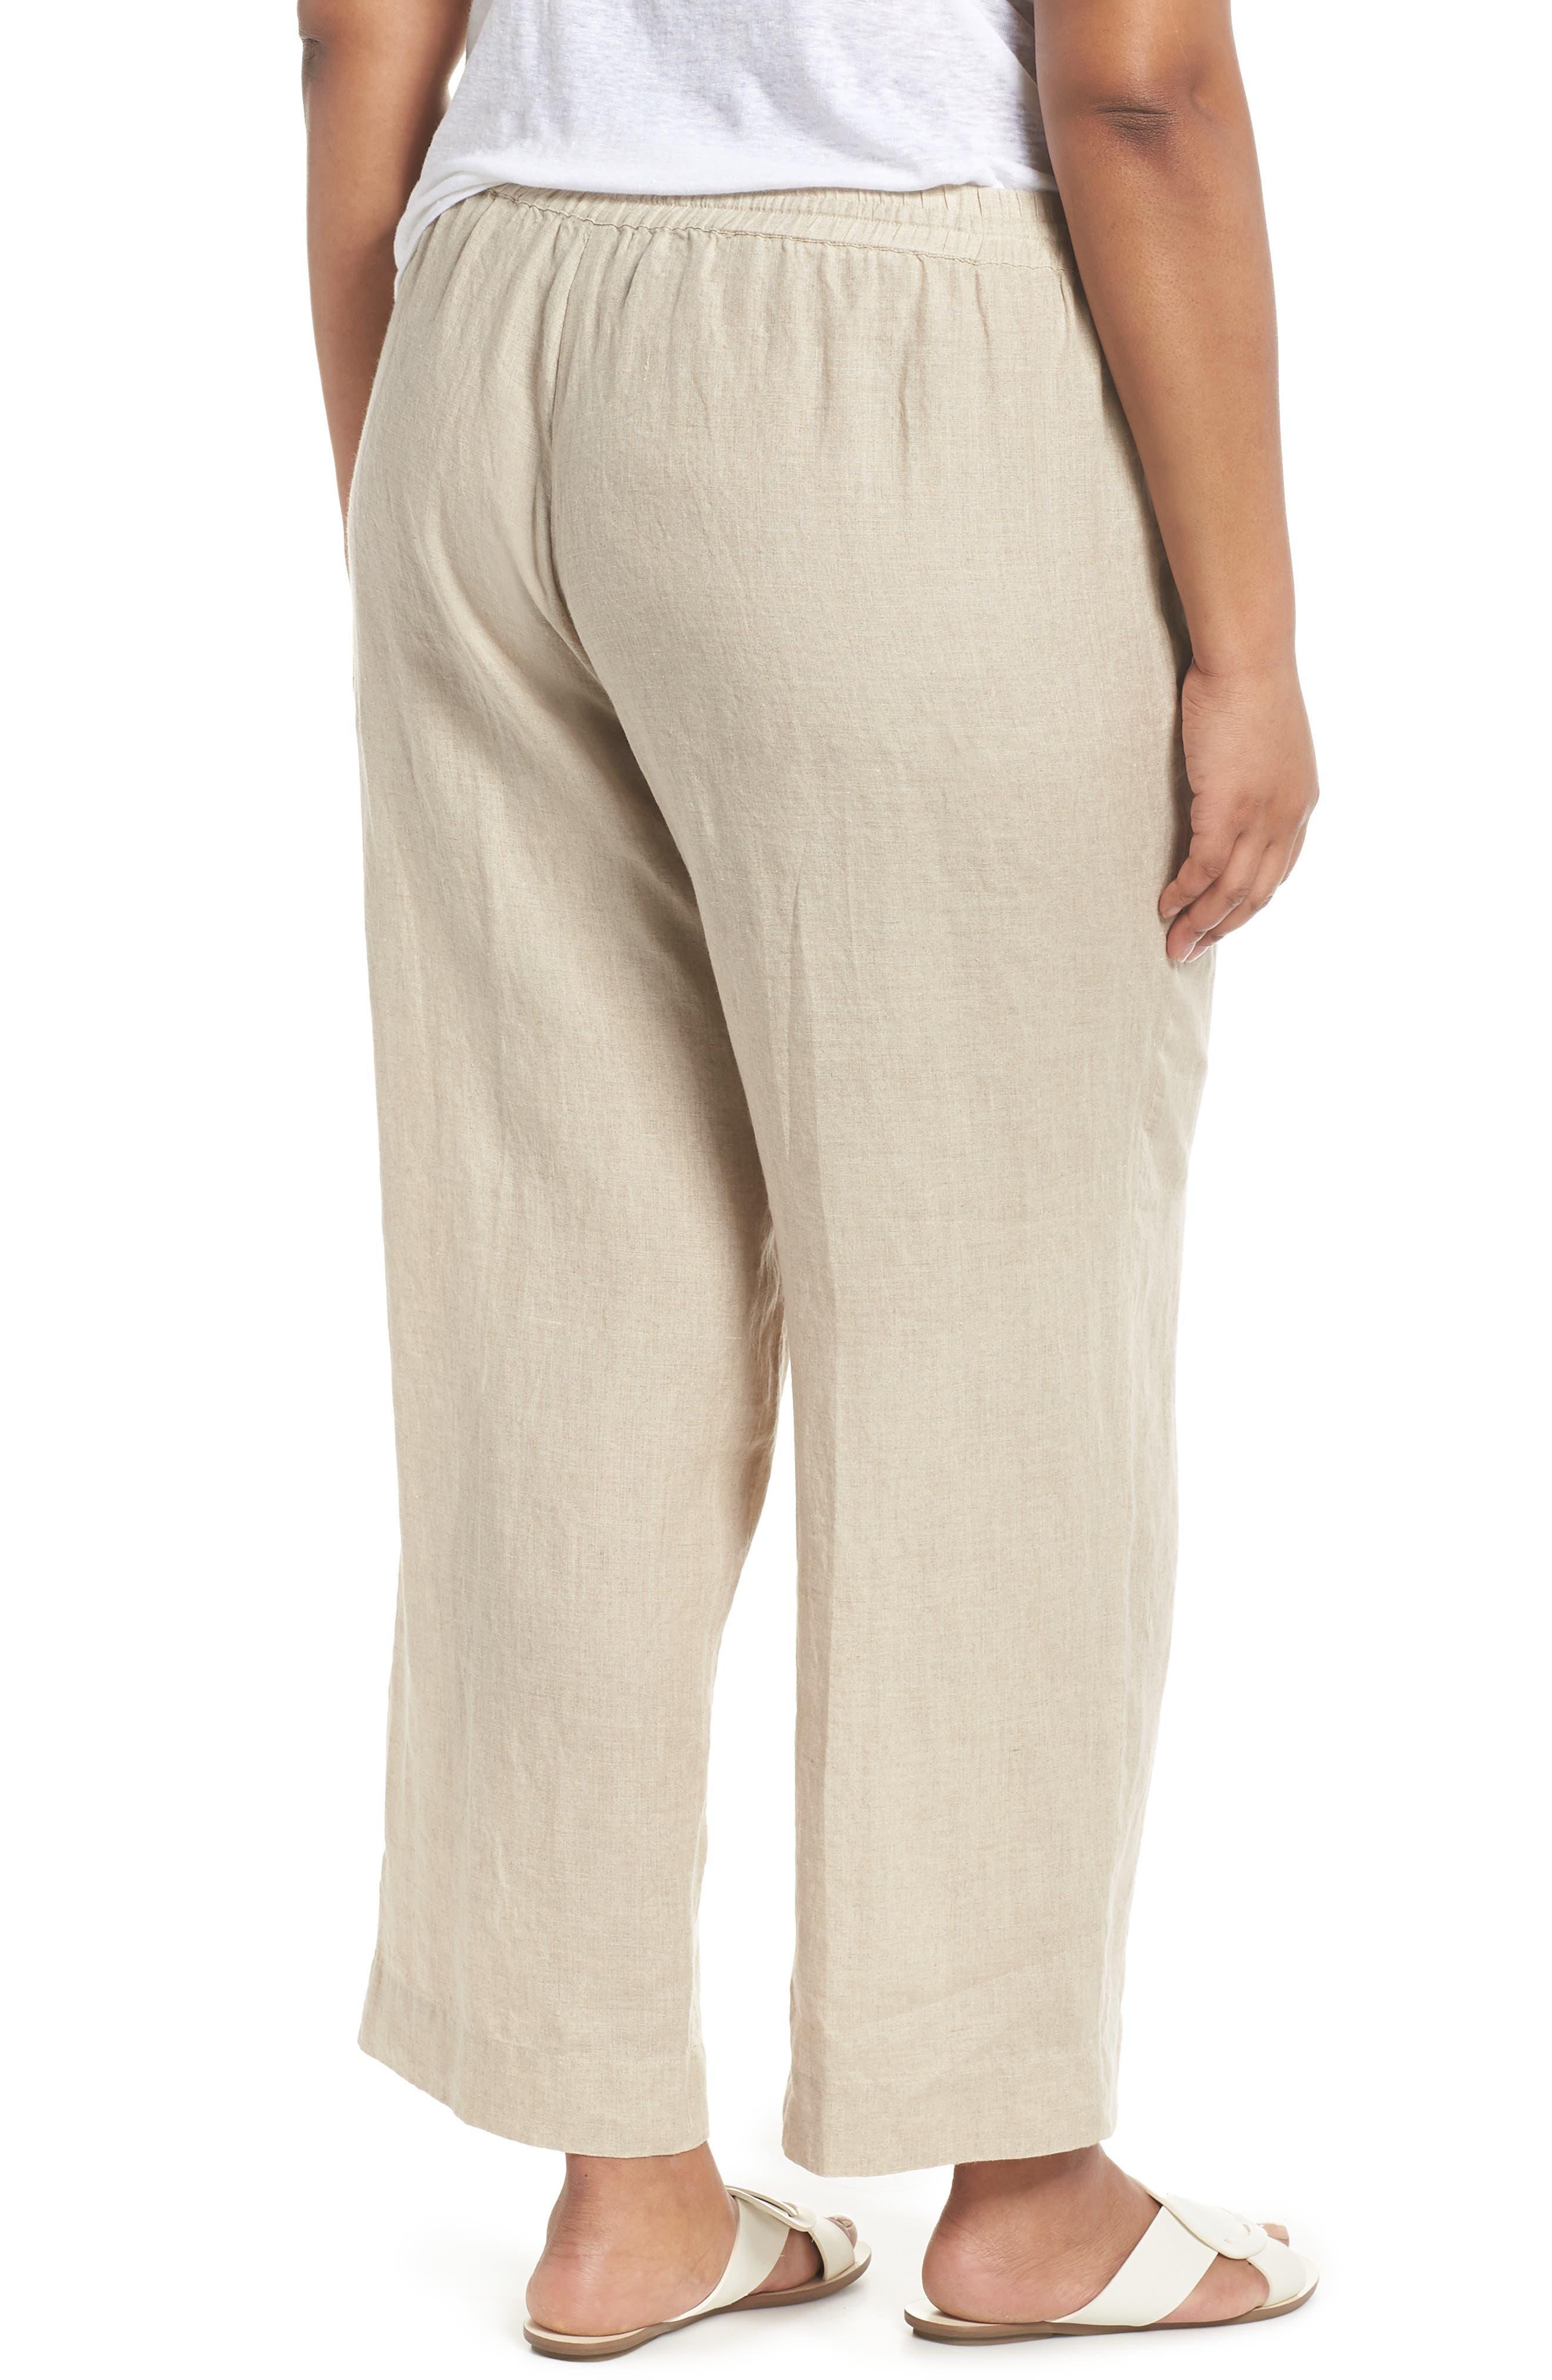 Organic Linen Ankle Pants,                             Alternate thumbnail 2, color,                             Undyed Natural